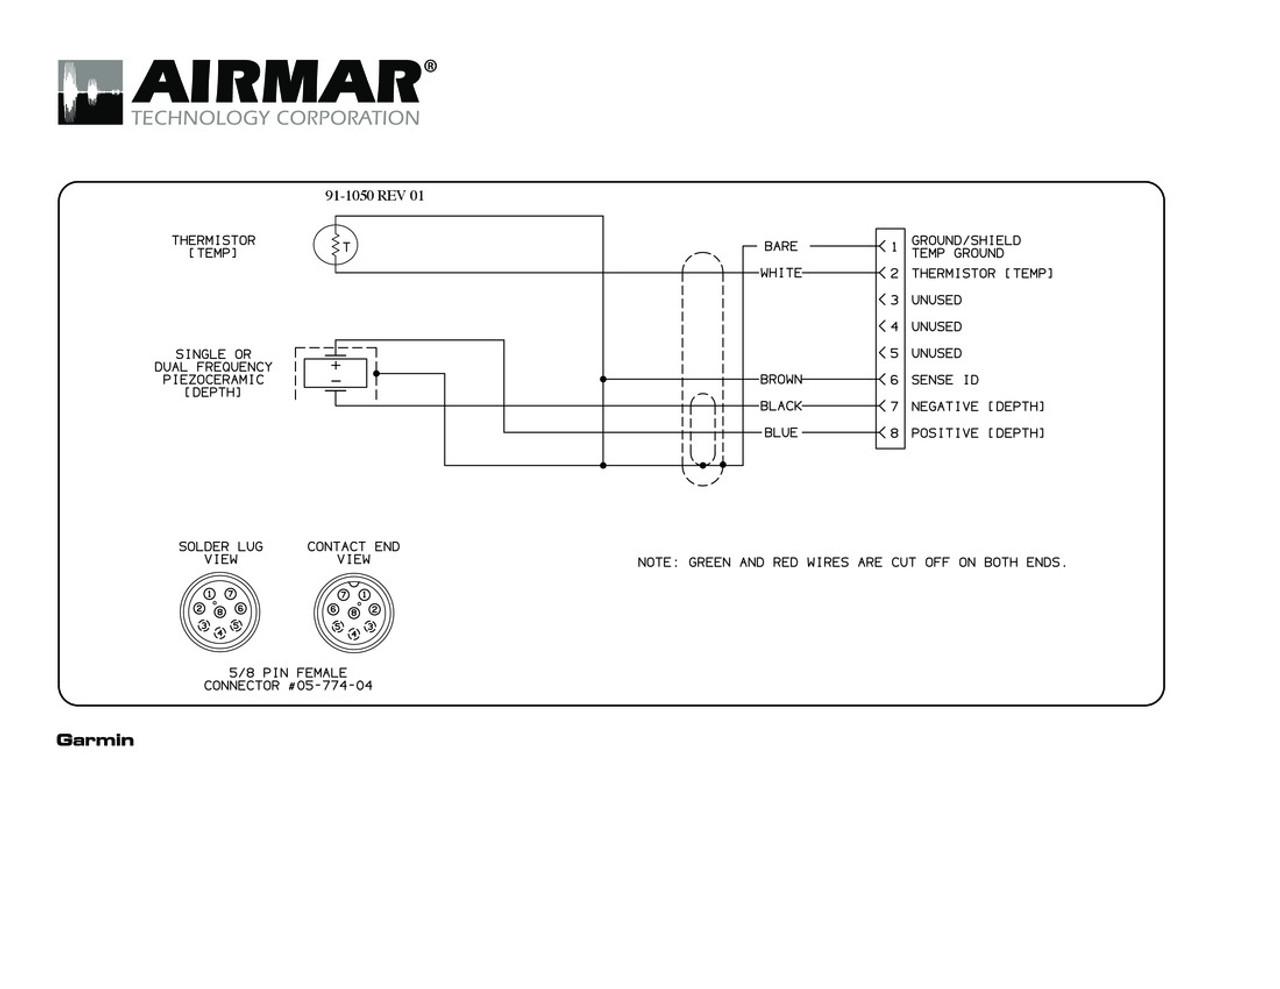 medium resolution of  garmin 17 gps wiring diagram wiring diagrams schematics garmin 3010c manual operator 18 5 wiring diagram